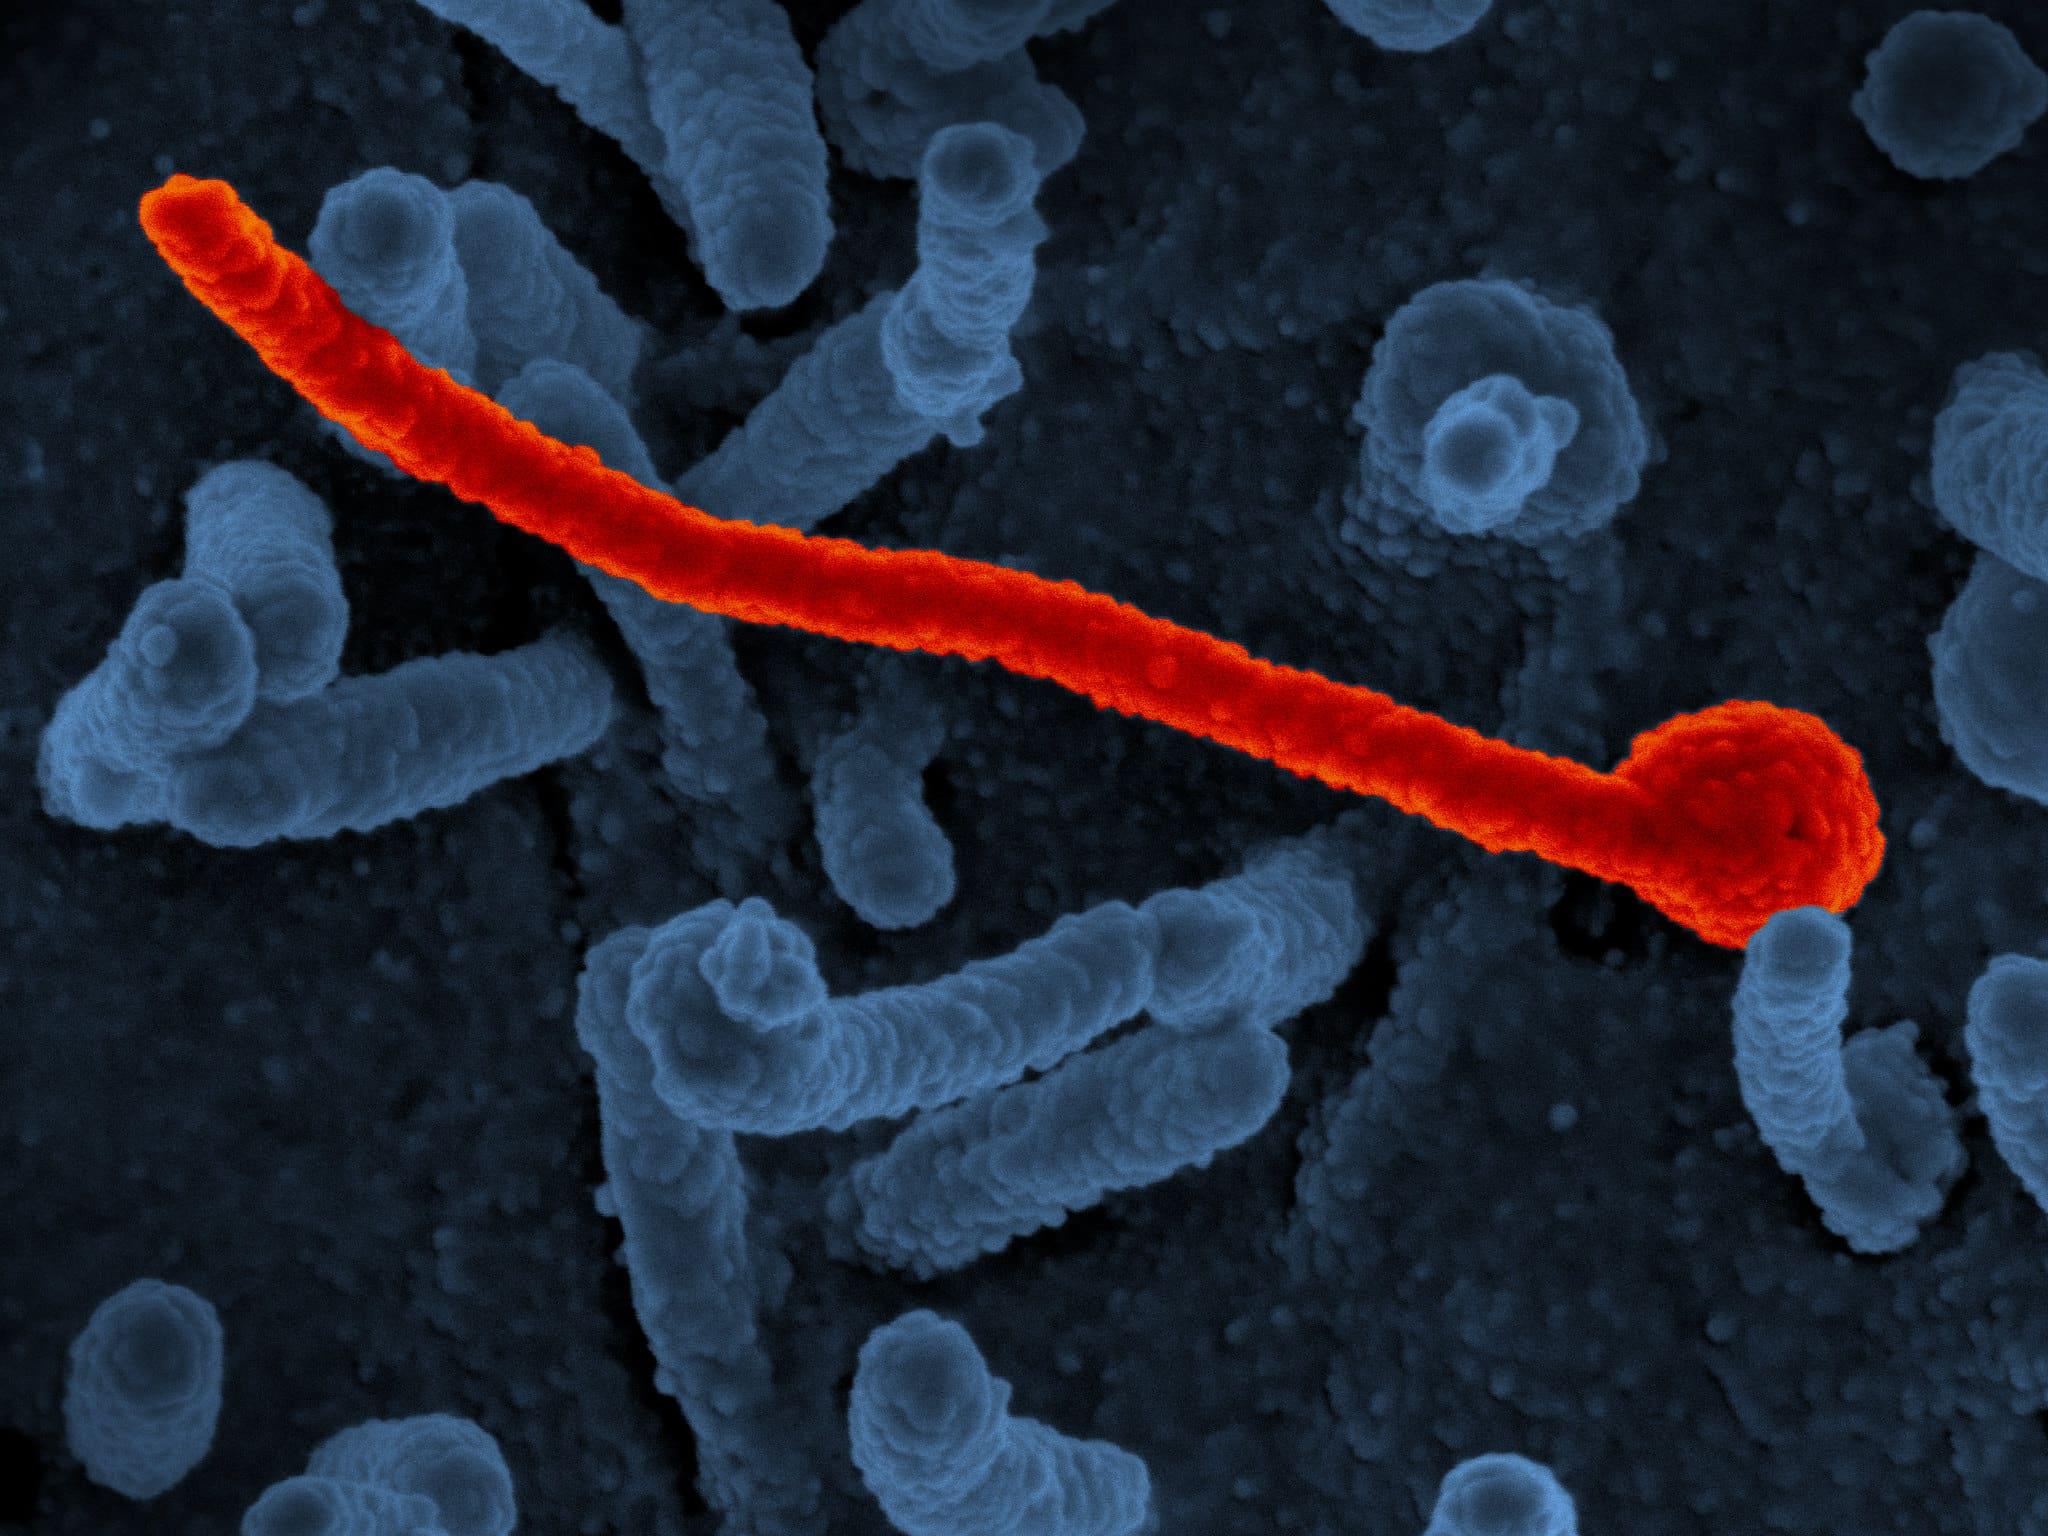 Ebola Survivors Can Pass on Disease Through Sexual Activity Image